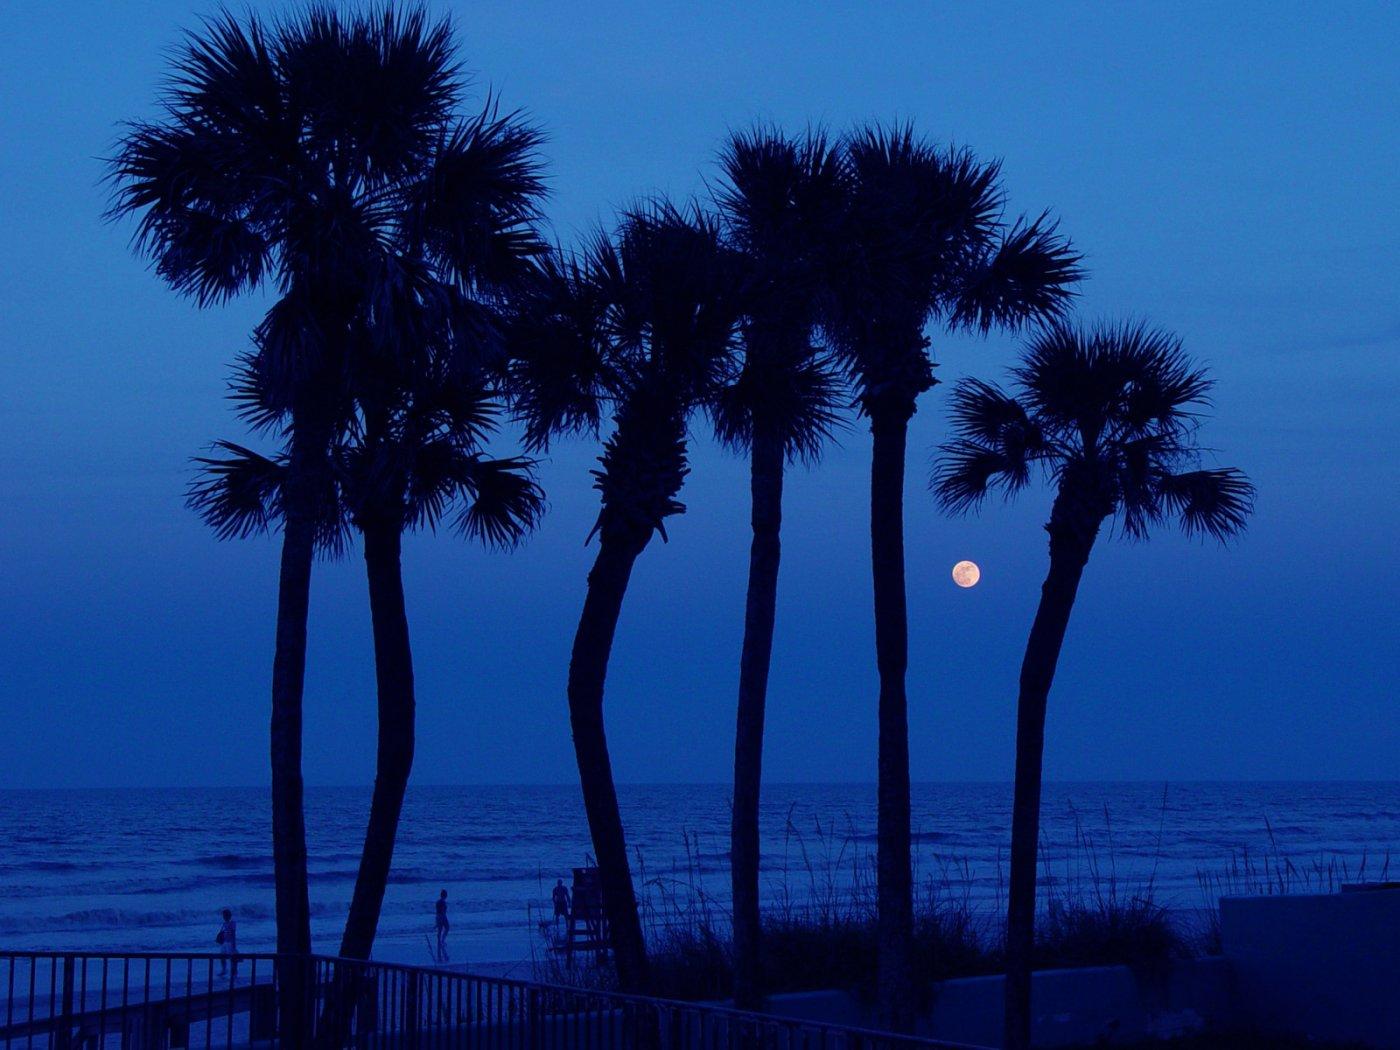 Daytona Beach Florida Night 1400x1050 Wallpapers 1400x1050 Wallpapers 1400x1050